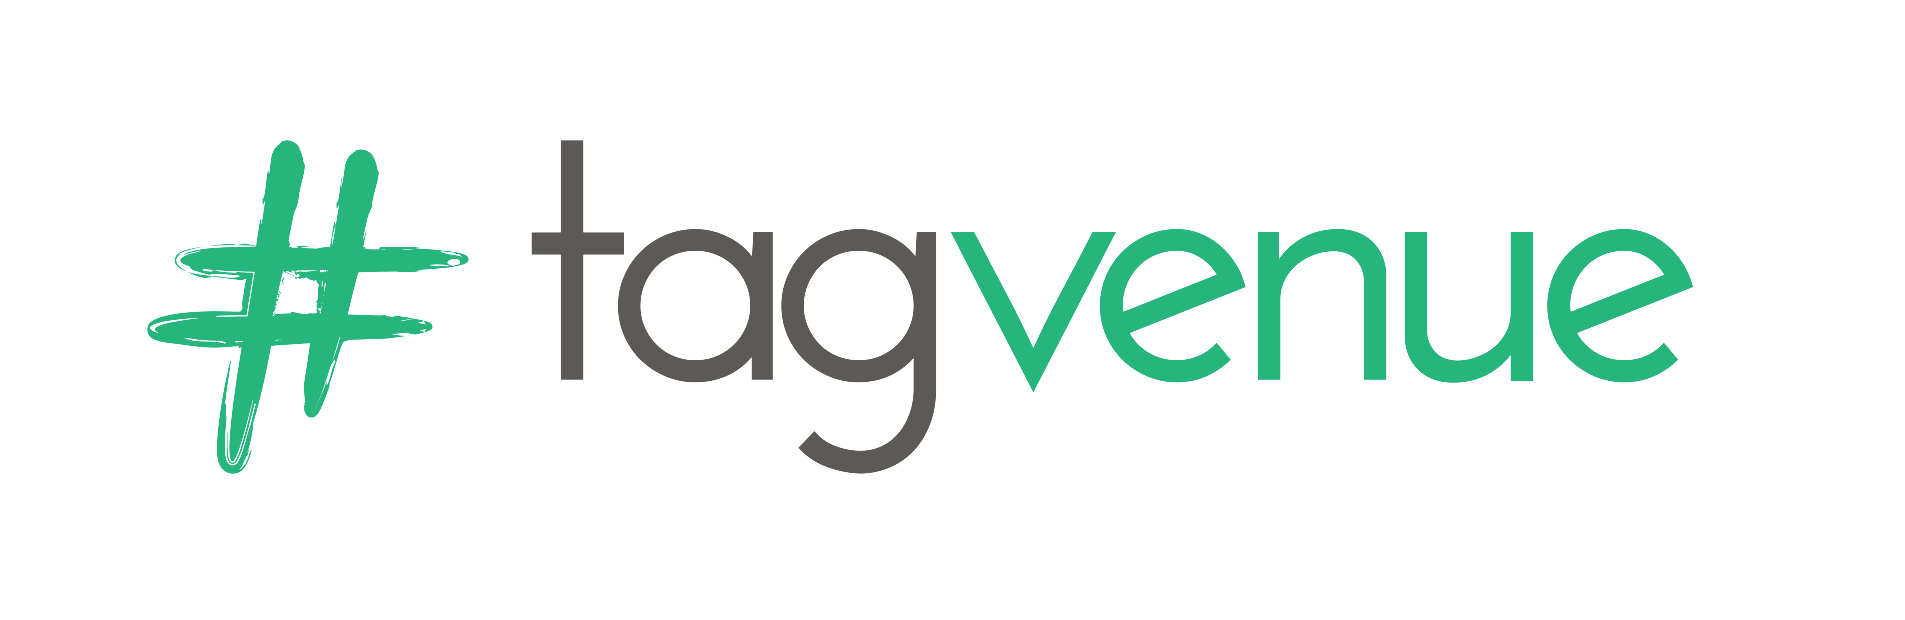 Read Tagvenue Reviews